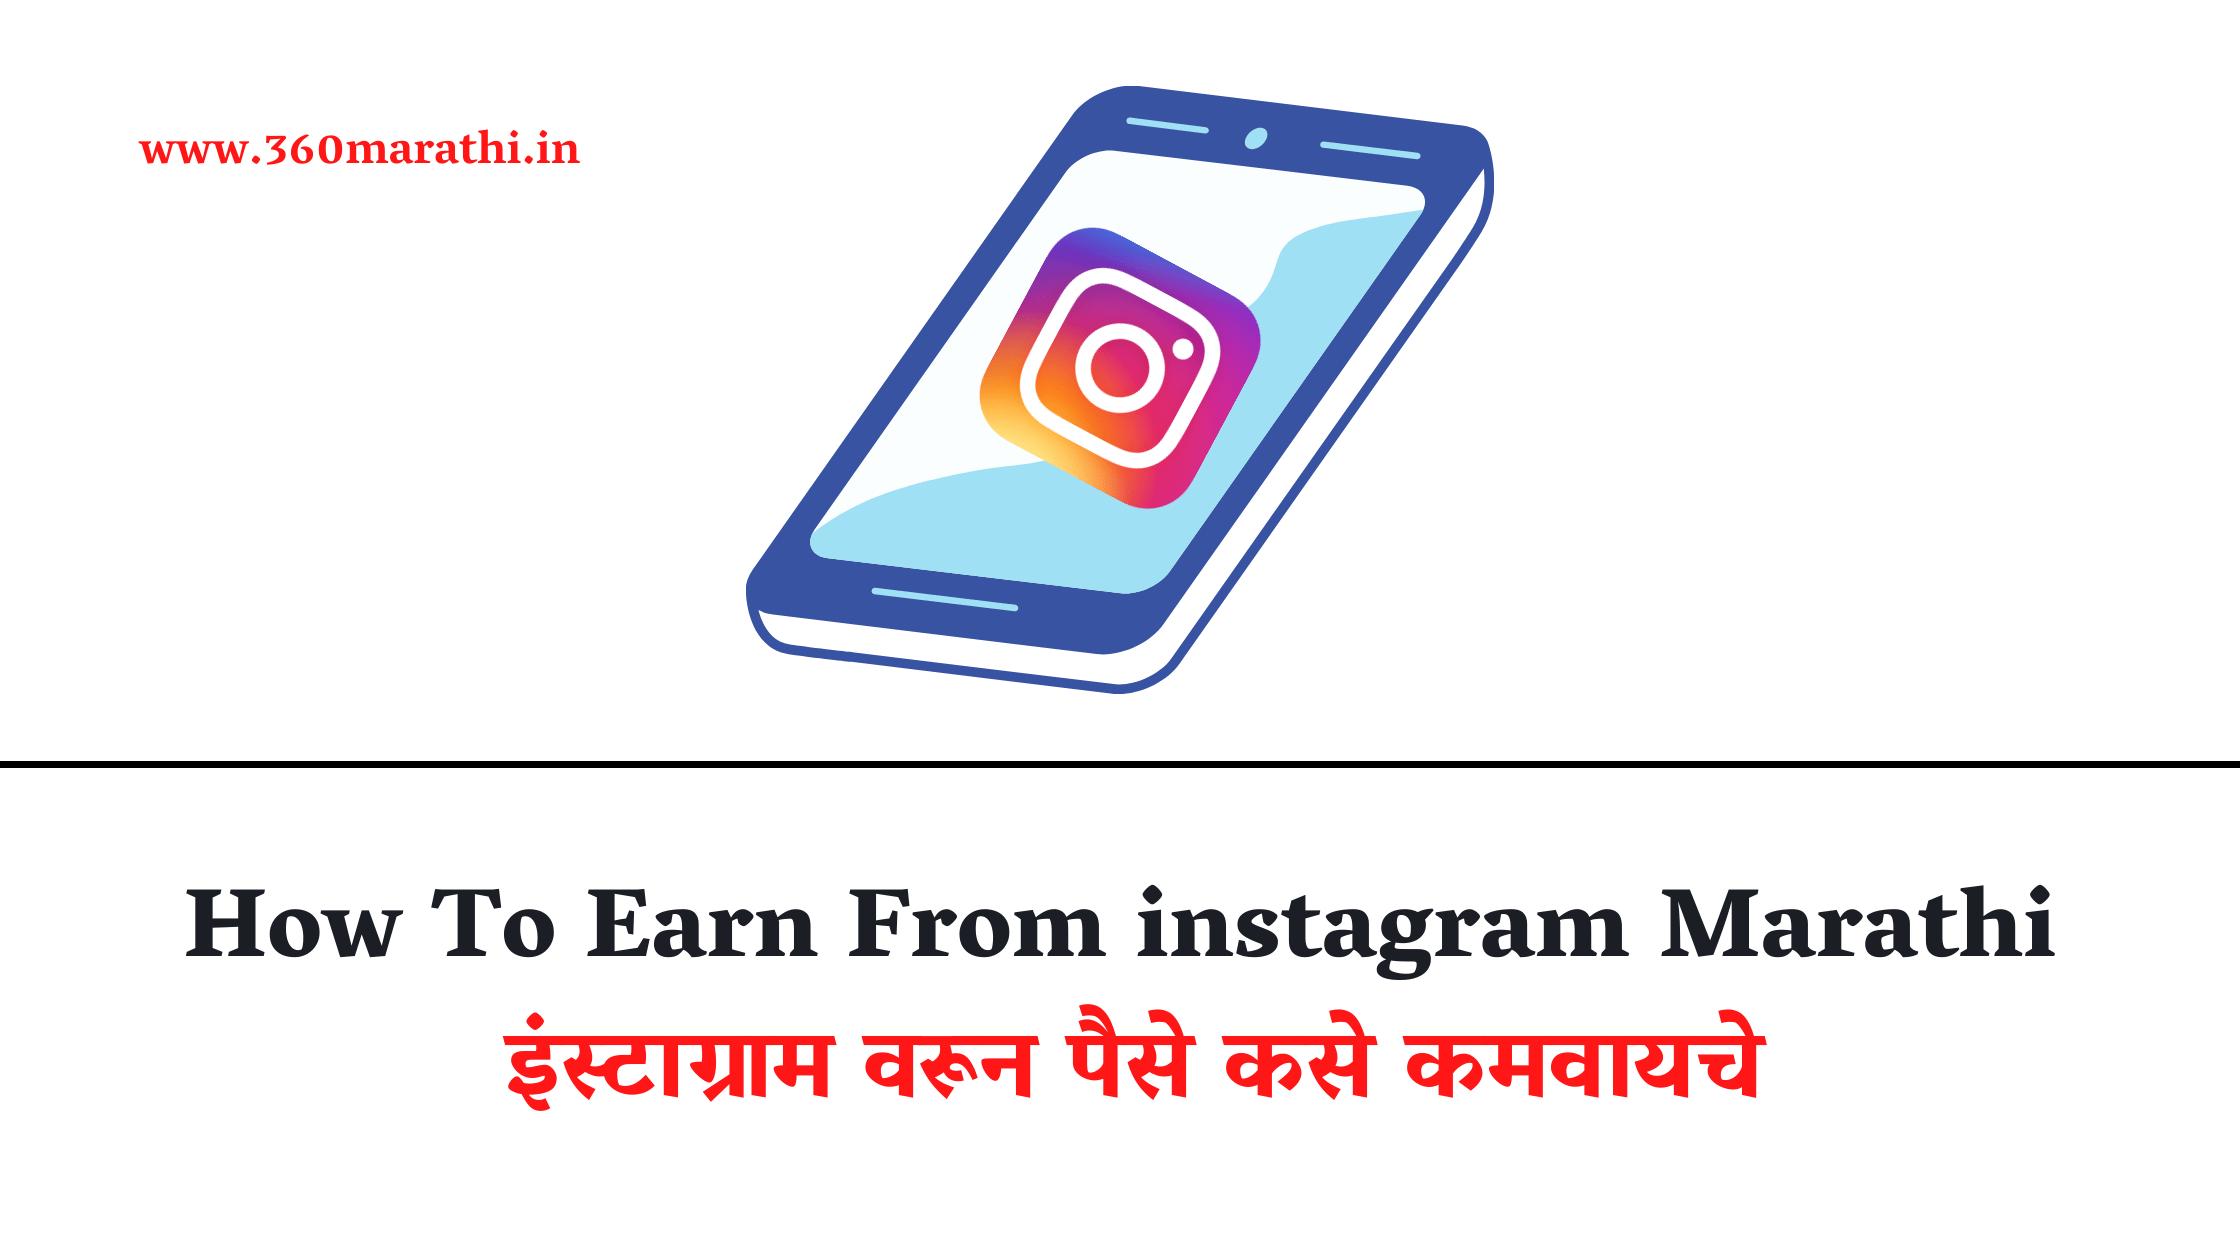 How To Earn Money From instagram Marathi   इंस्टाग्राम वरून पैसे कसे कमवायचे